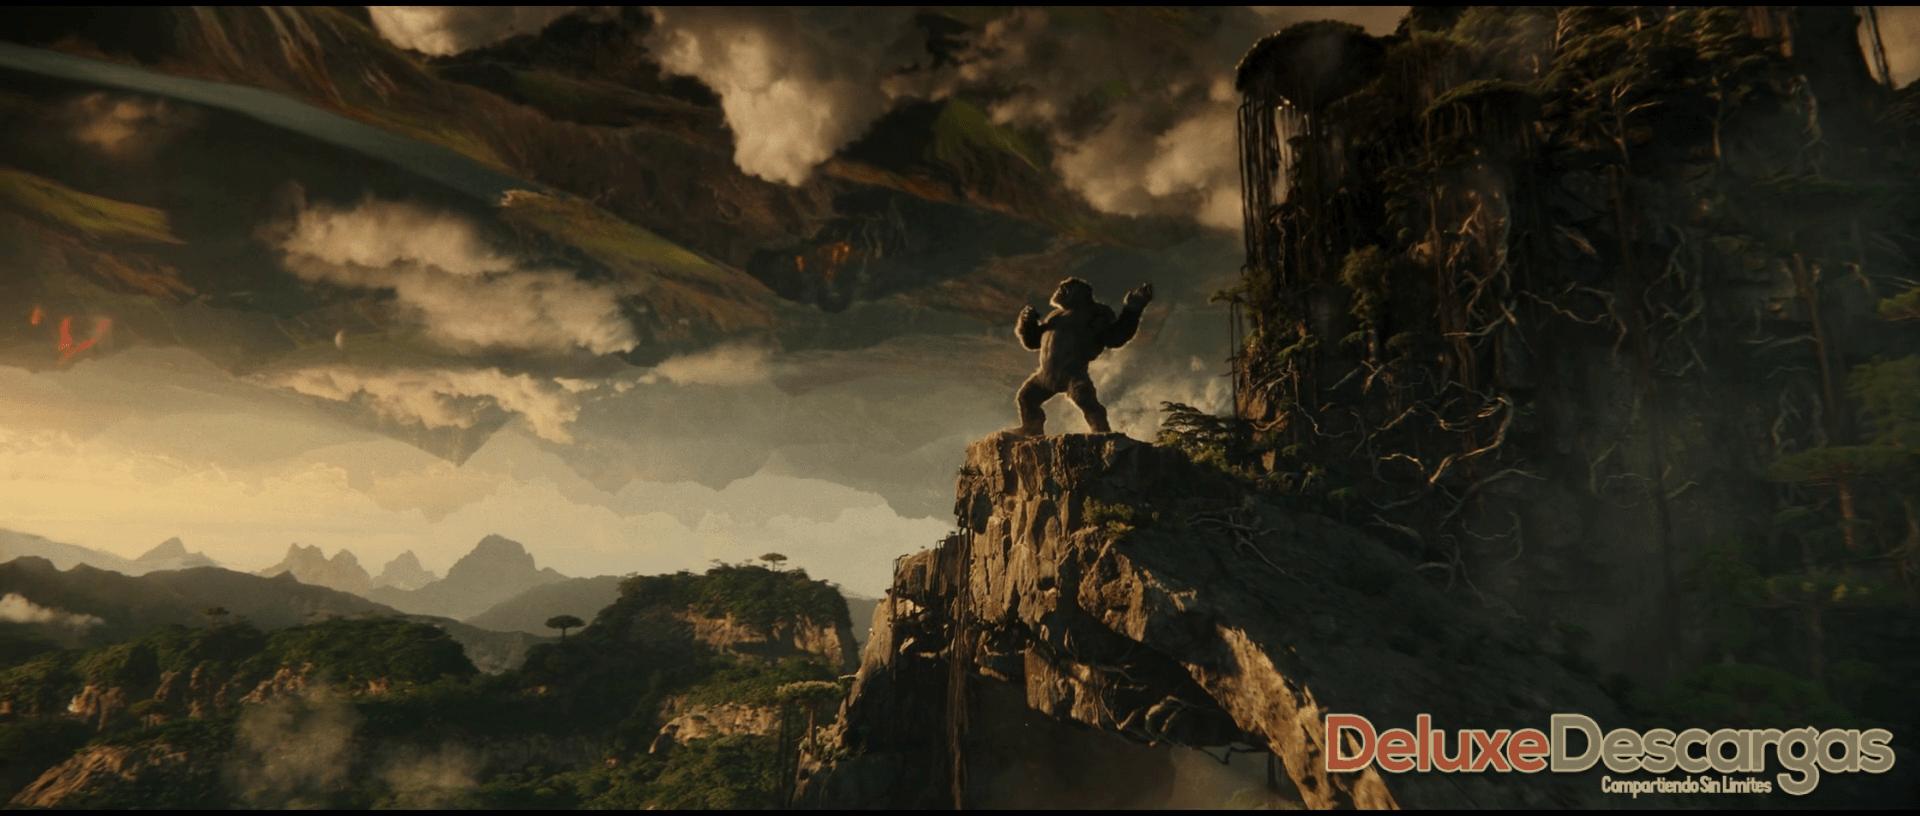 Godzilla vs Kong 1080p (1) min